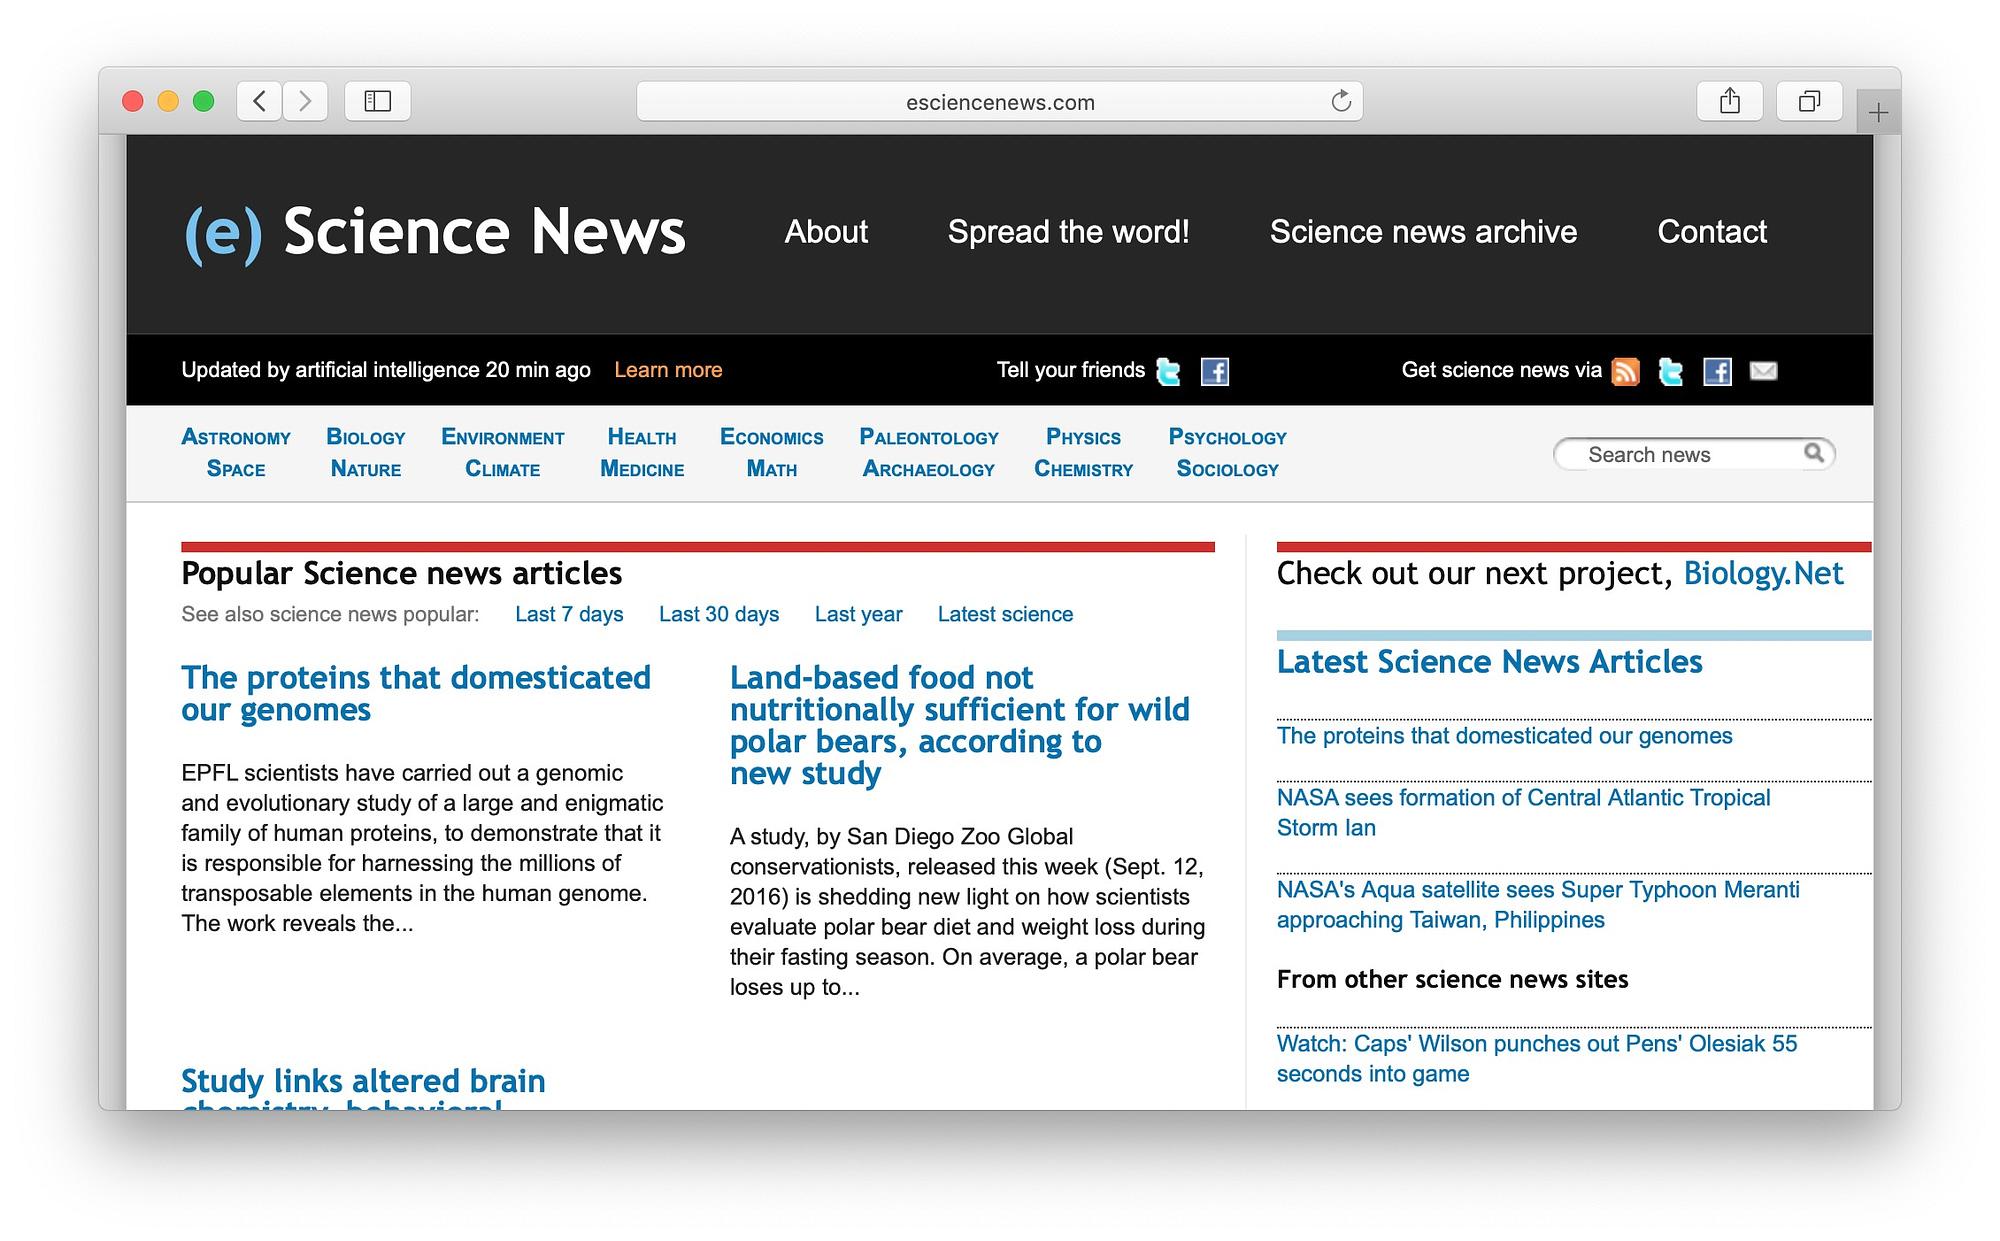 eScience News is a popular science news aggregator